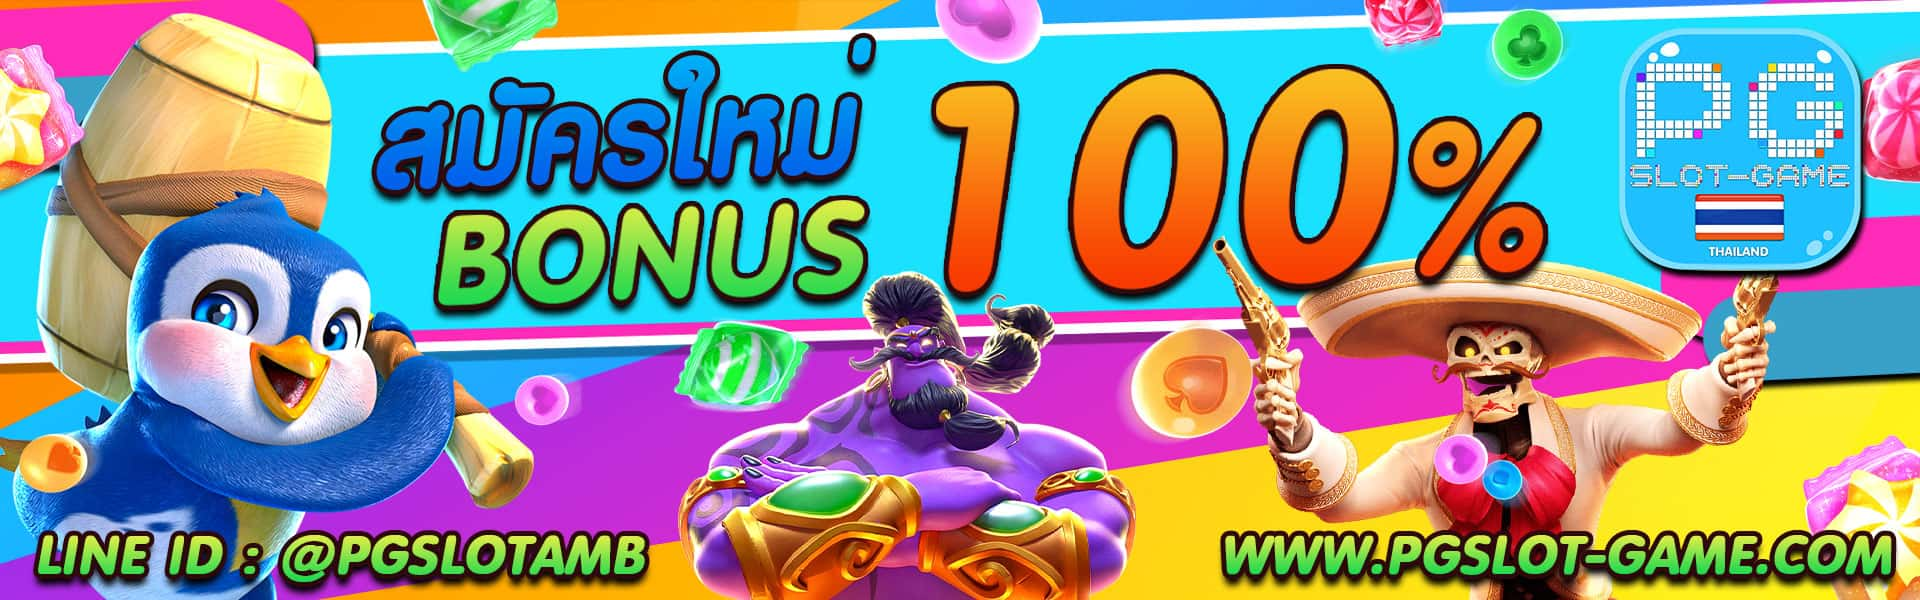 pgslot-Candy-banner